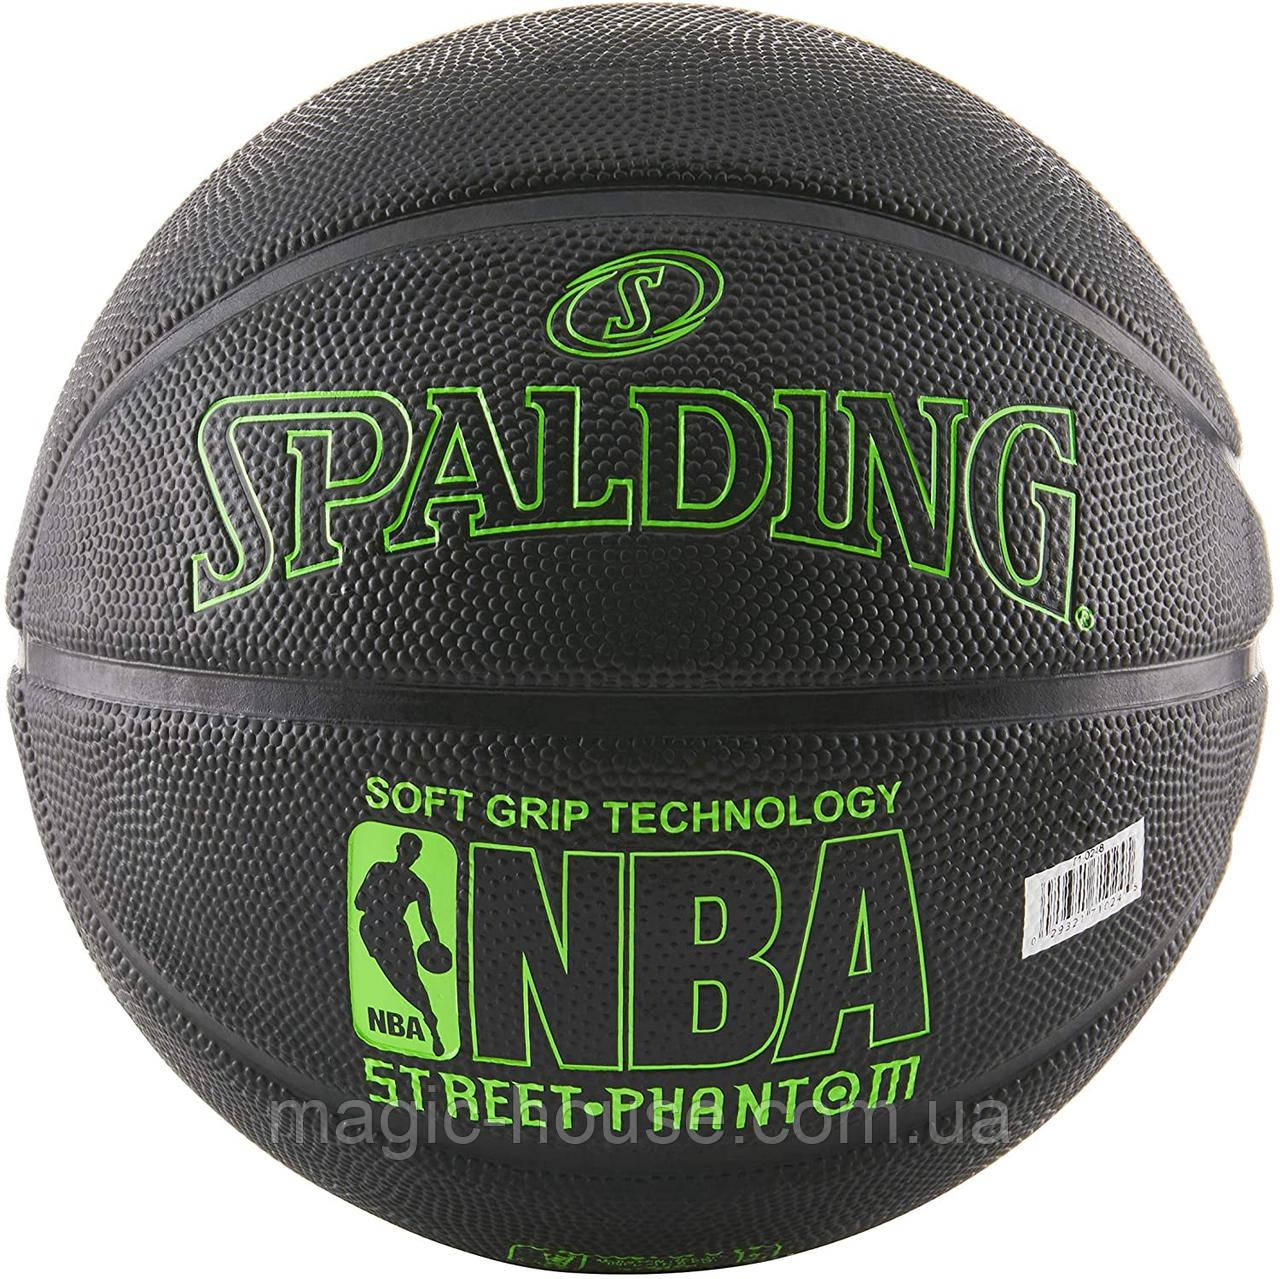 Мяч баскетбольный Spalding NBA Street Phantom оригинал размер 7